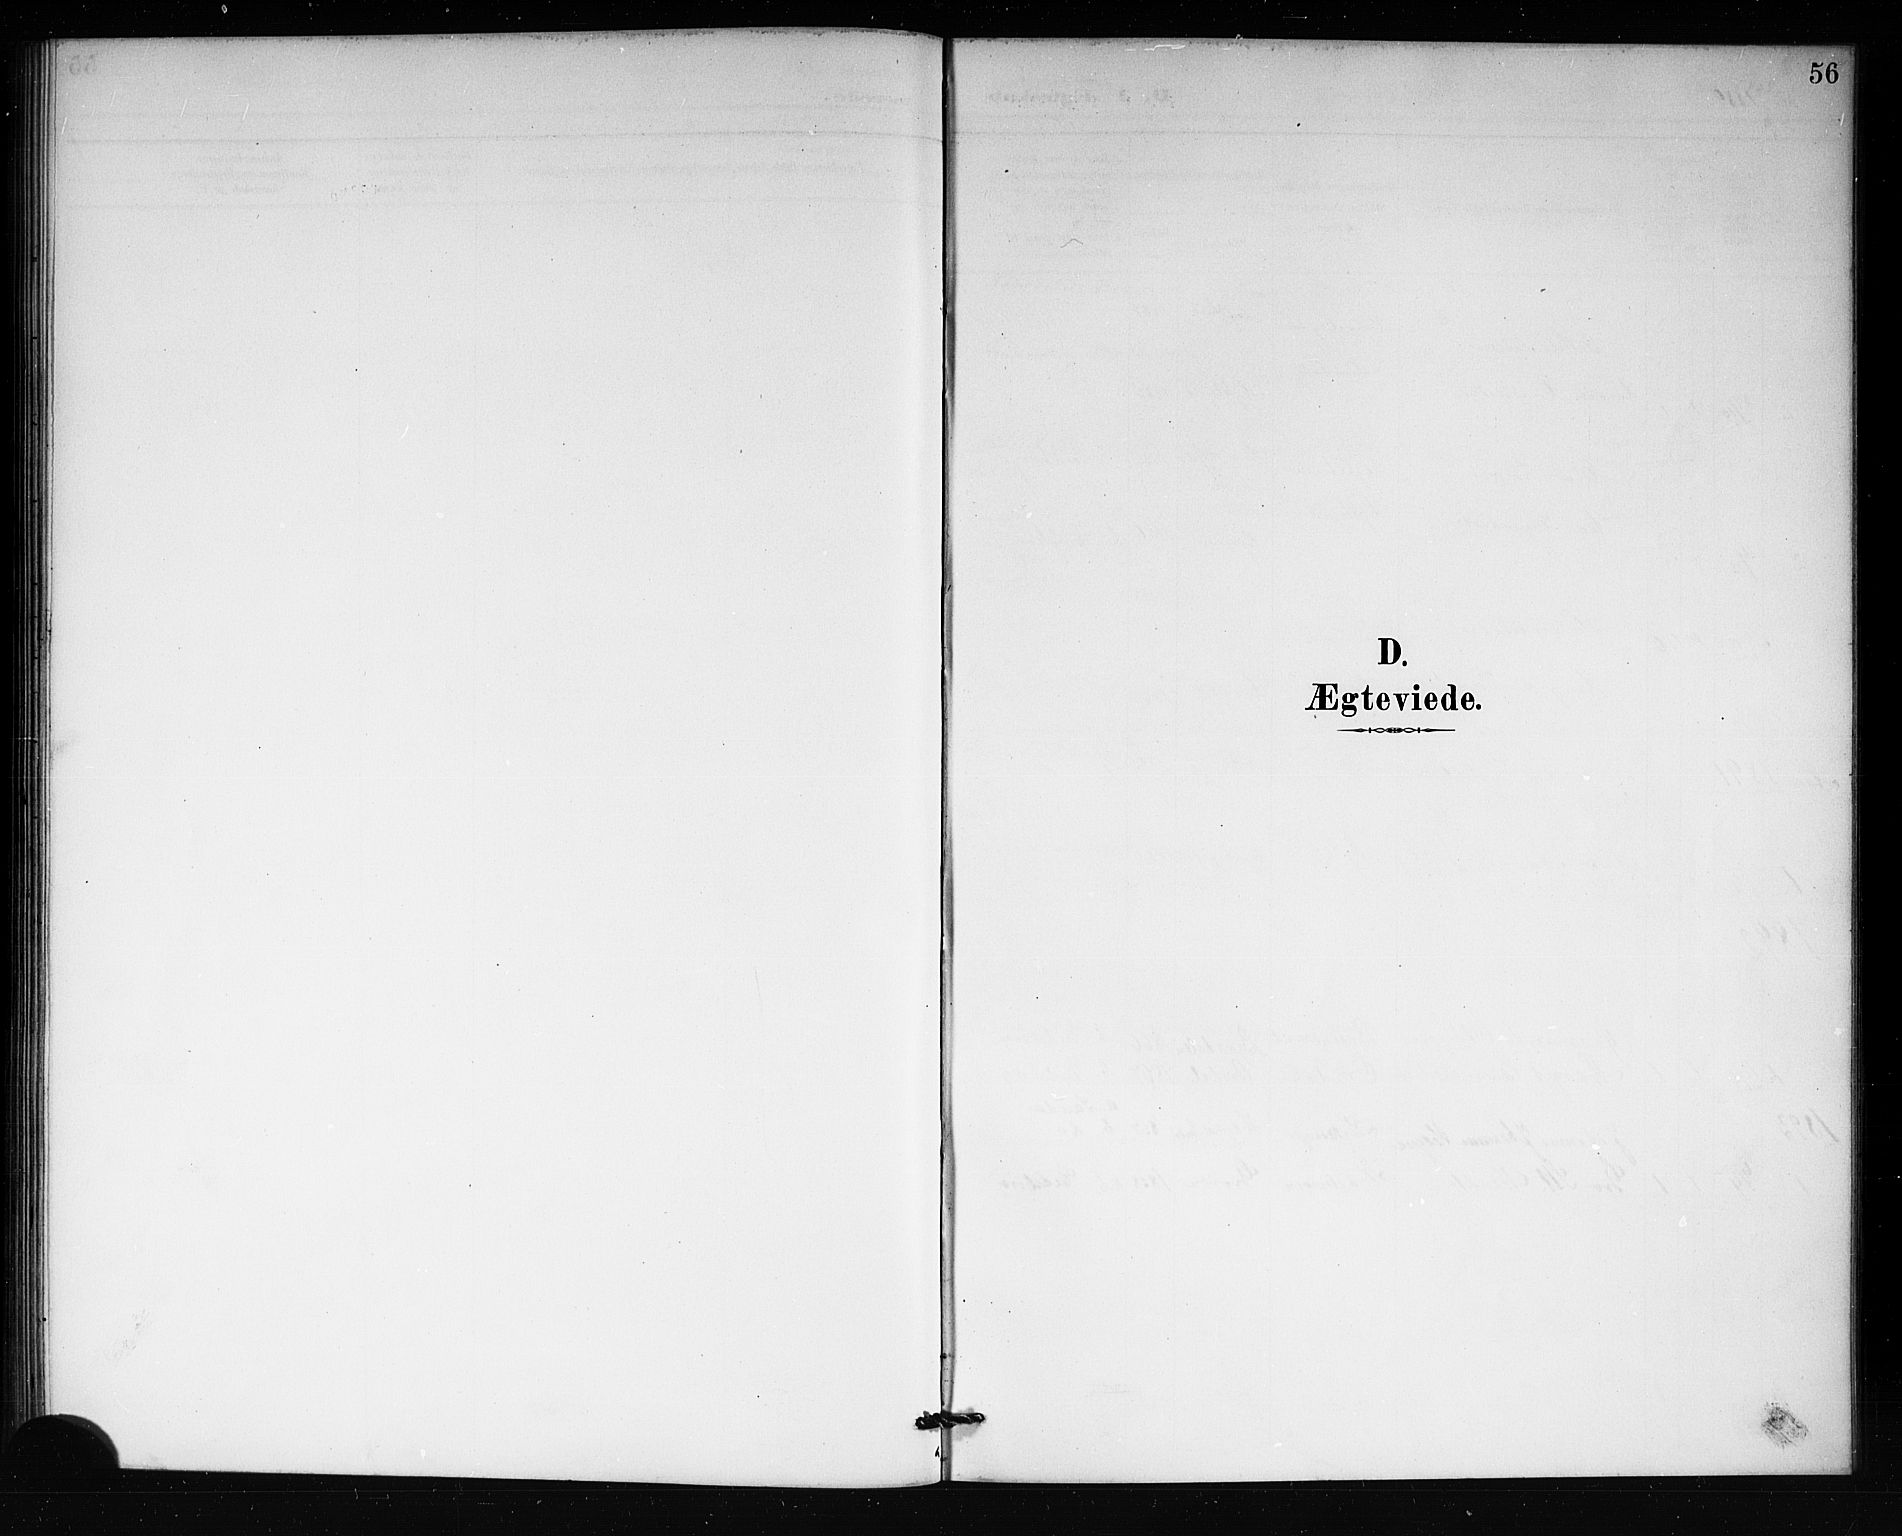 SAKO, Lårdal kirkebøker, G/Gb/L0003: Klokkerbok nr. II 3, 1889-1920, s. 56